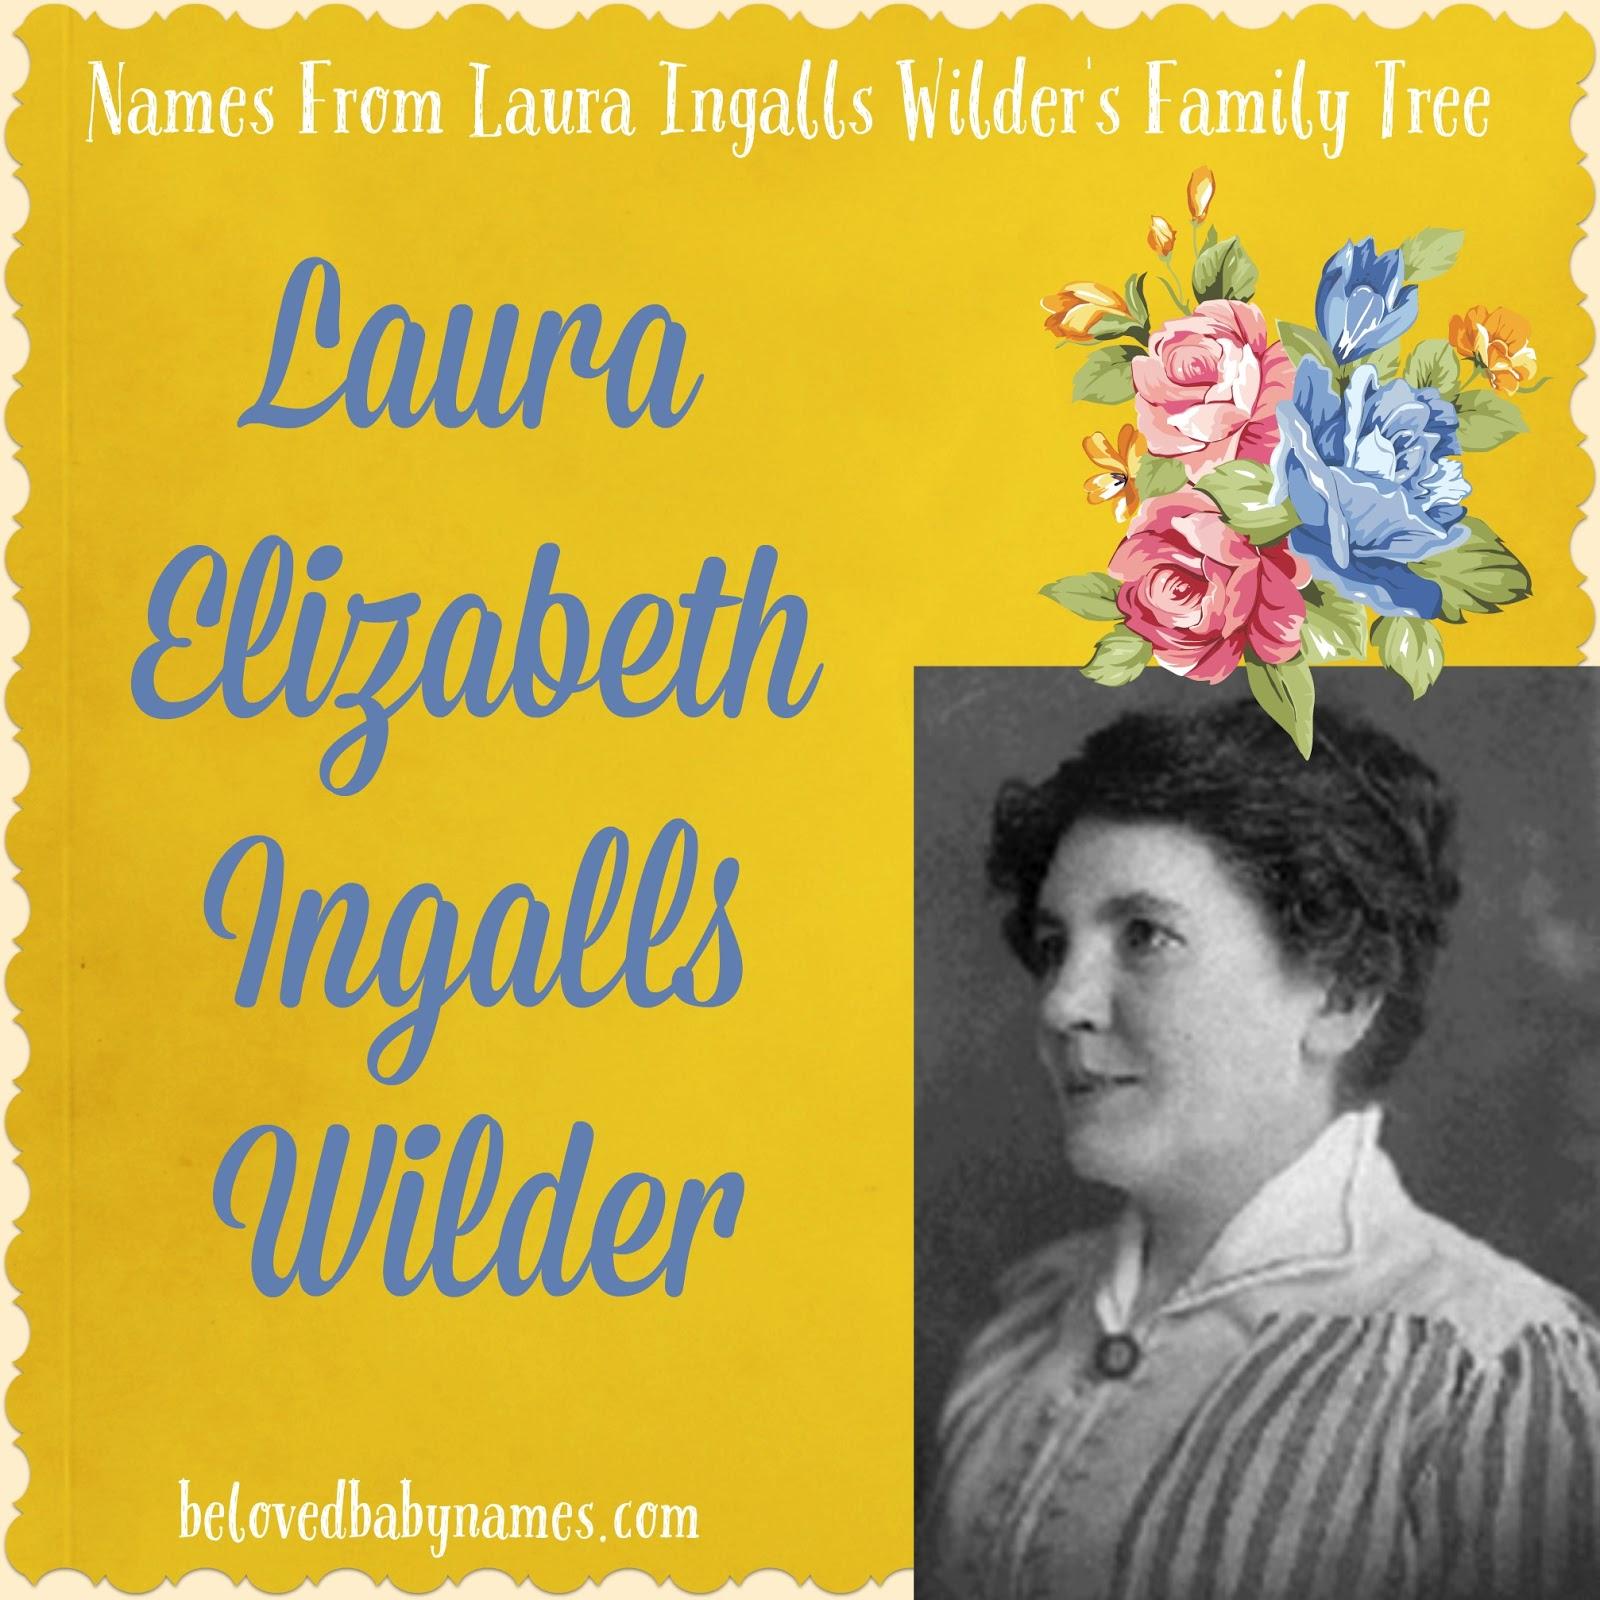 laura ingalls wilder family tree